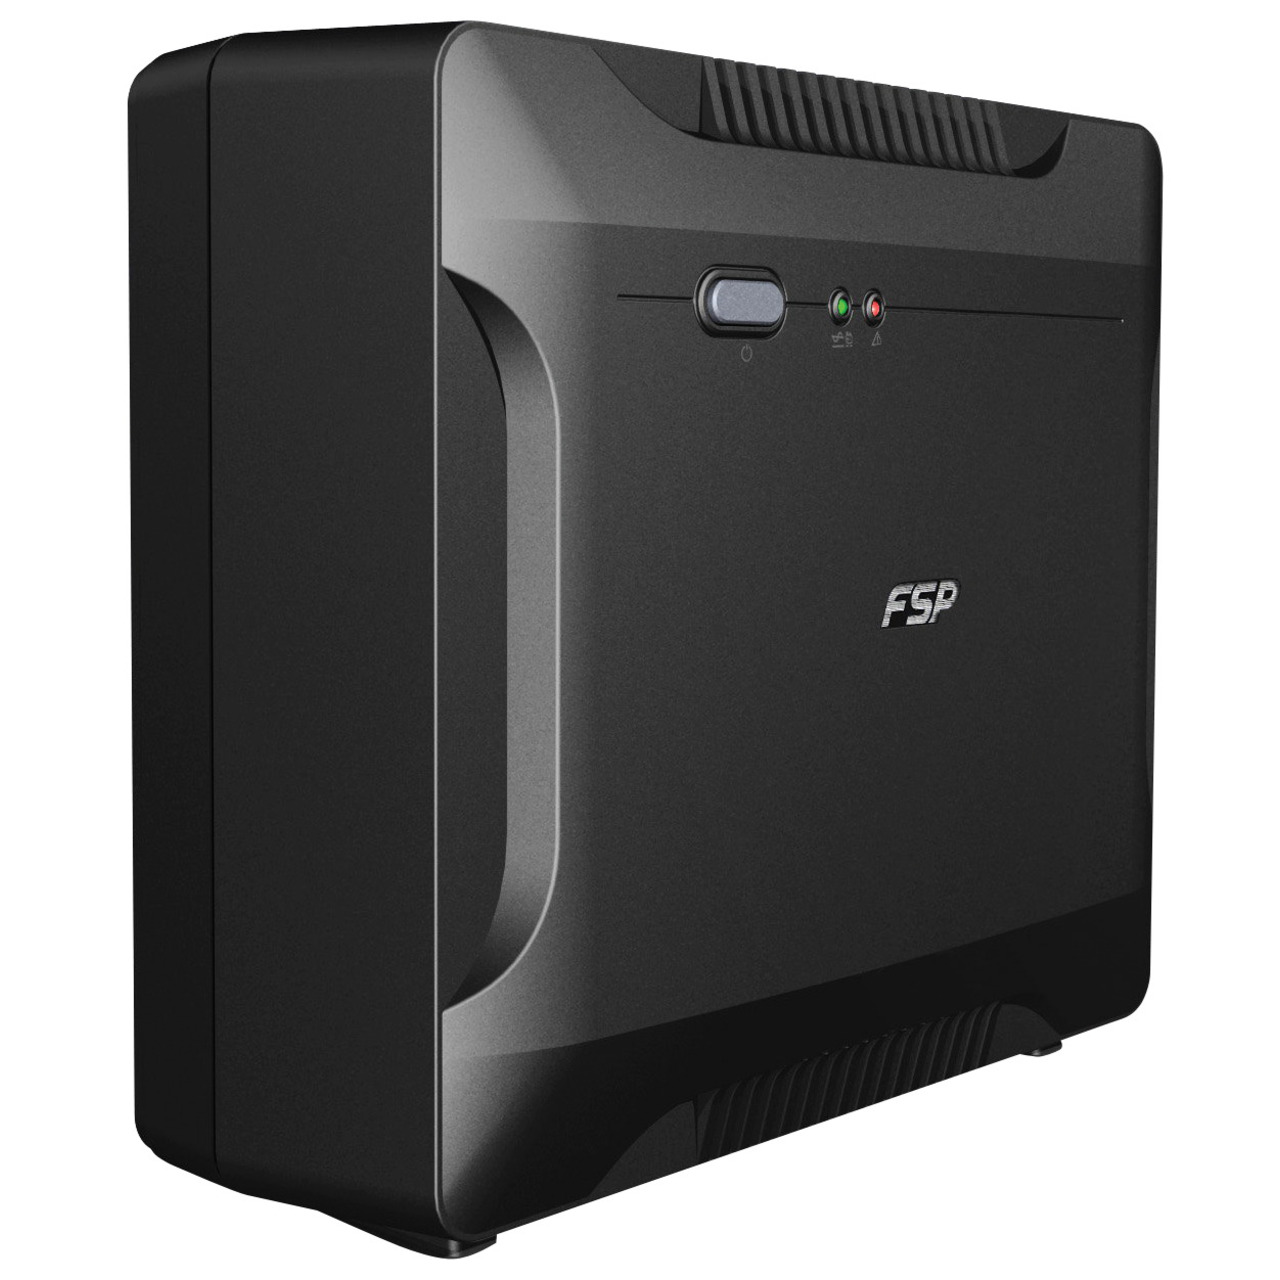 FSP Fortron USV-Anlage Nano 800- 800 VA